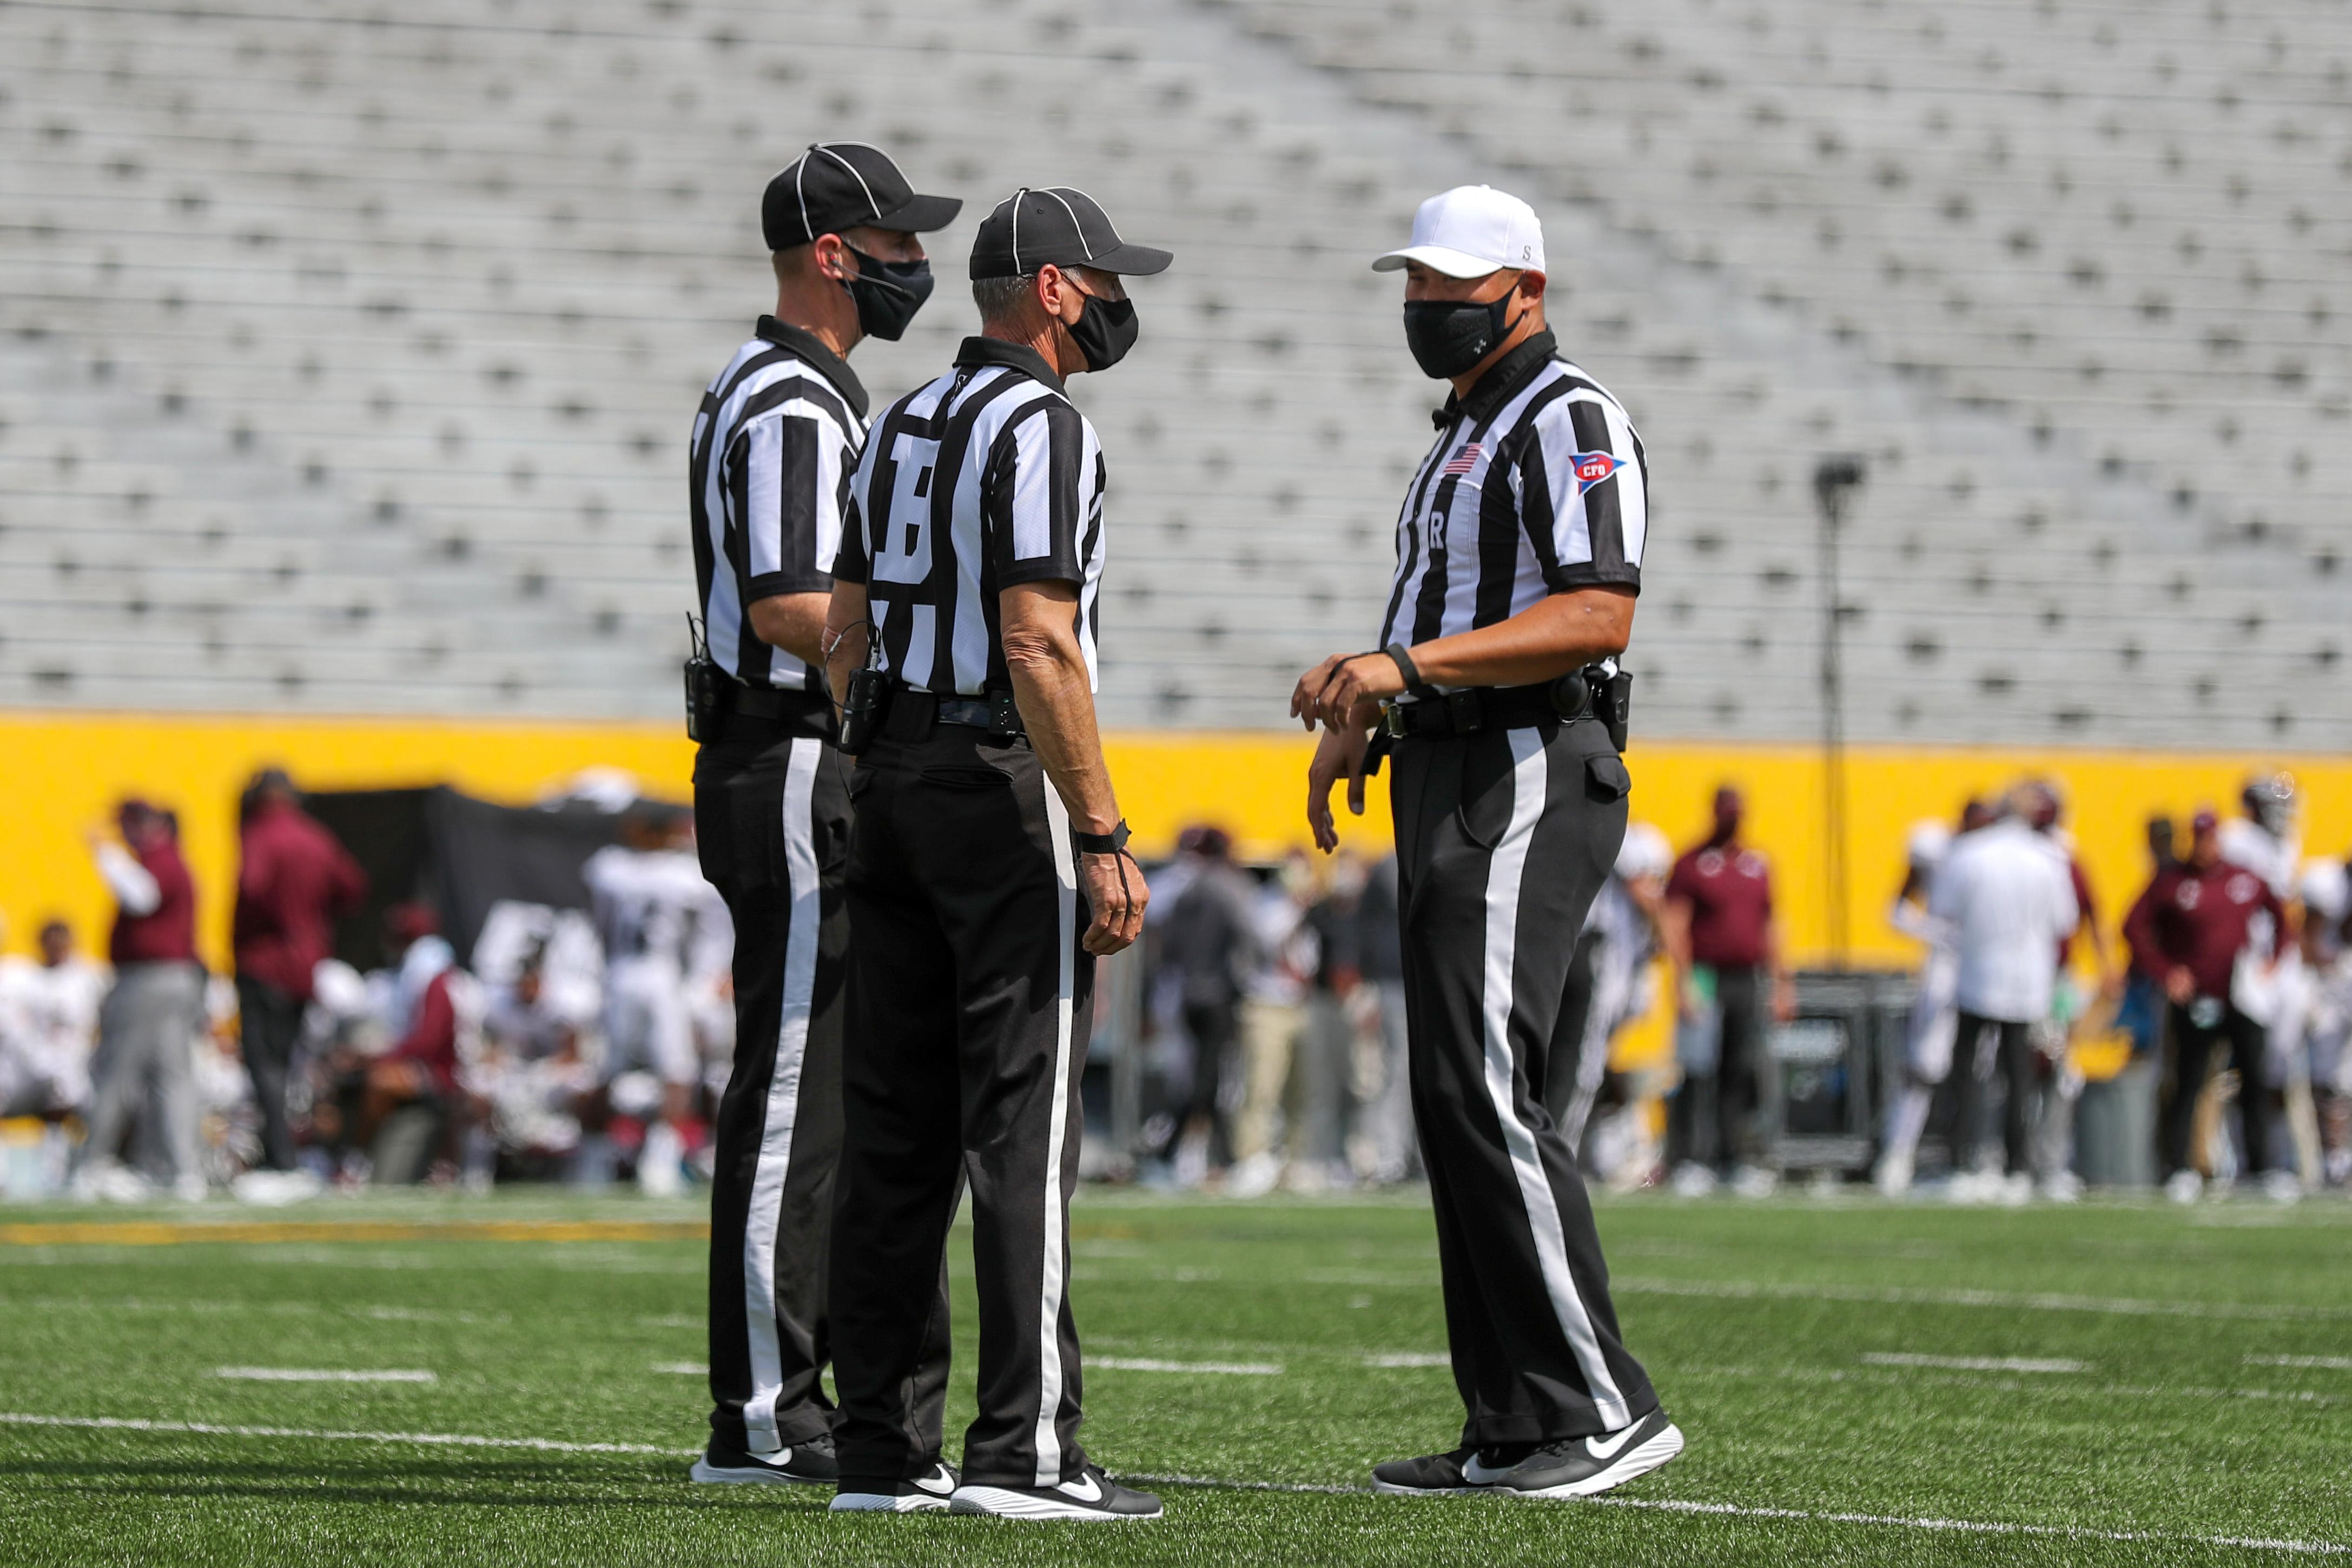 COLLEGE FOOTBALL: SEP 12 Eastern Kentucky at West Virginia